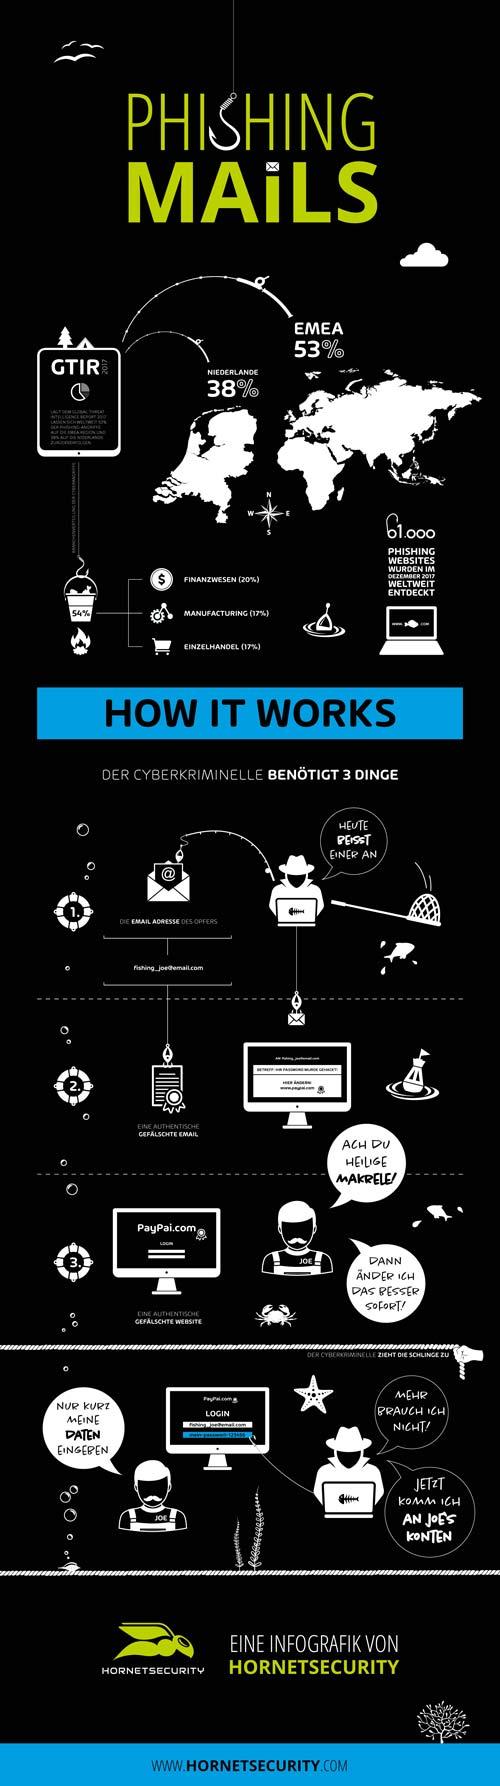 Phishing Infografik von Hornetsecurity